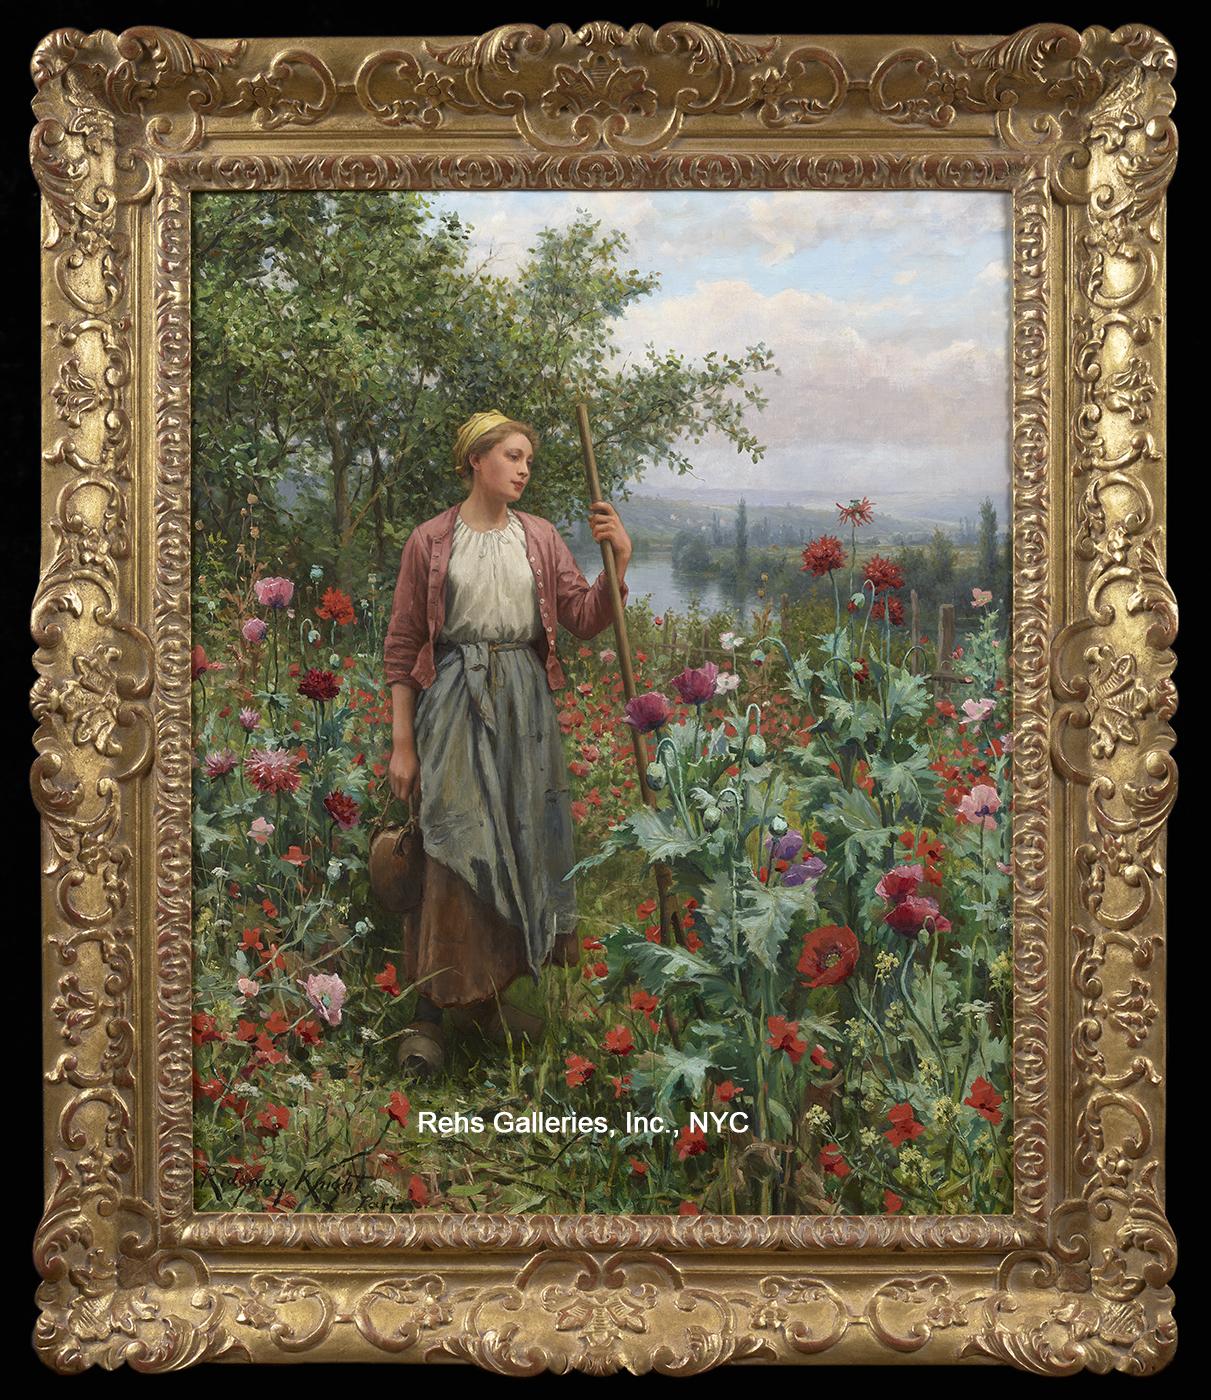 daniel_ridgway_knight_e1345_maria_among_the_poppies_framed_wm.jpg